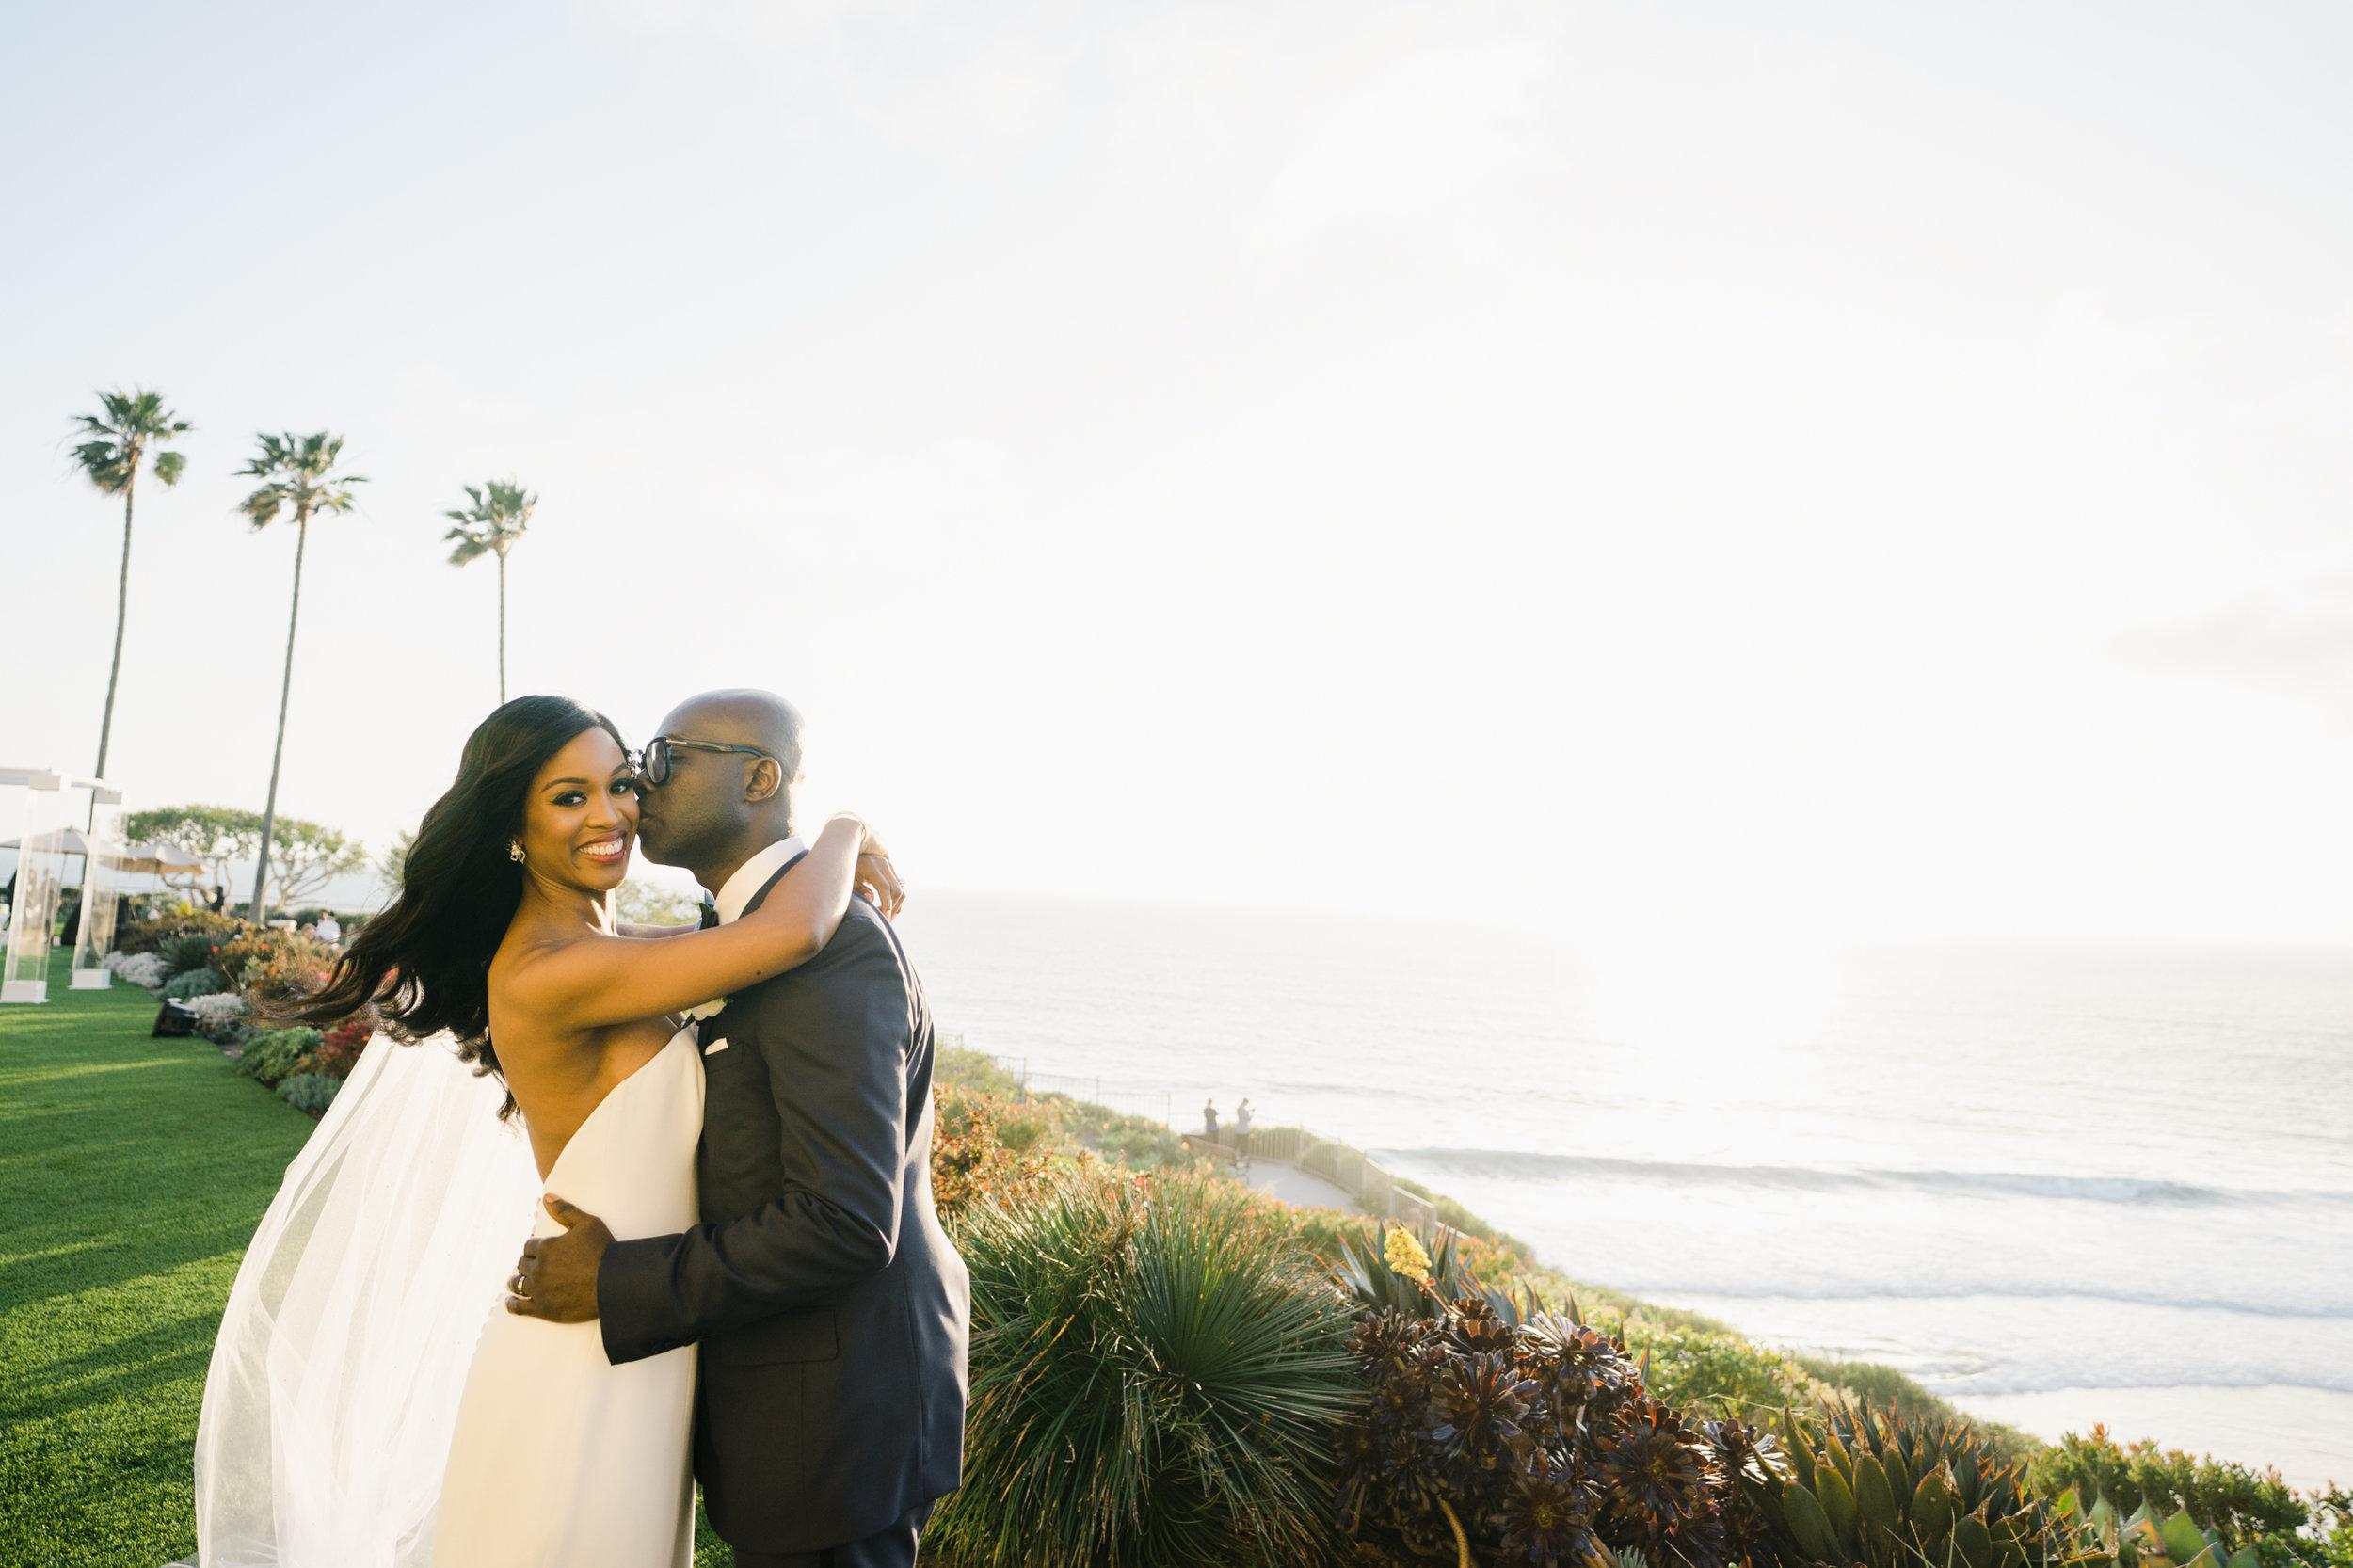 ritz-carlton-laguna-niguel-wedding-sonya_0150.JPG